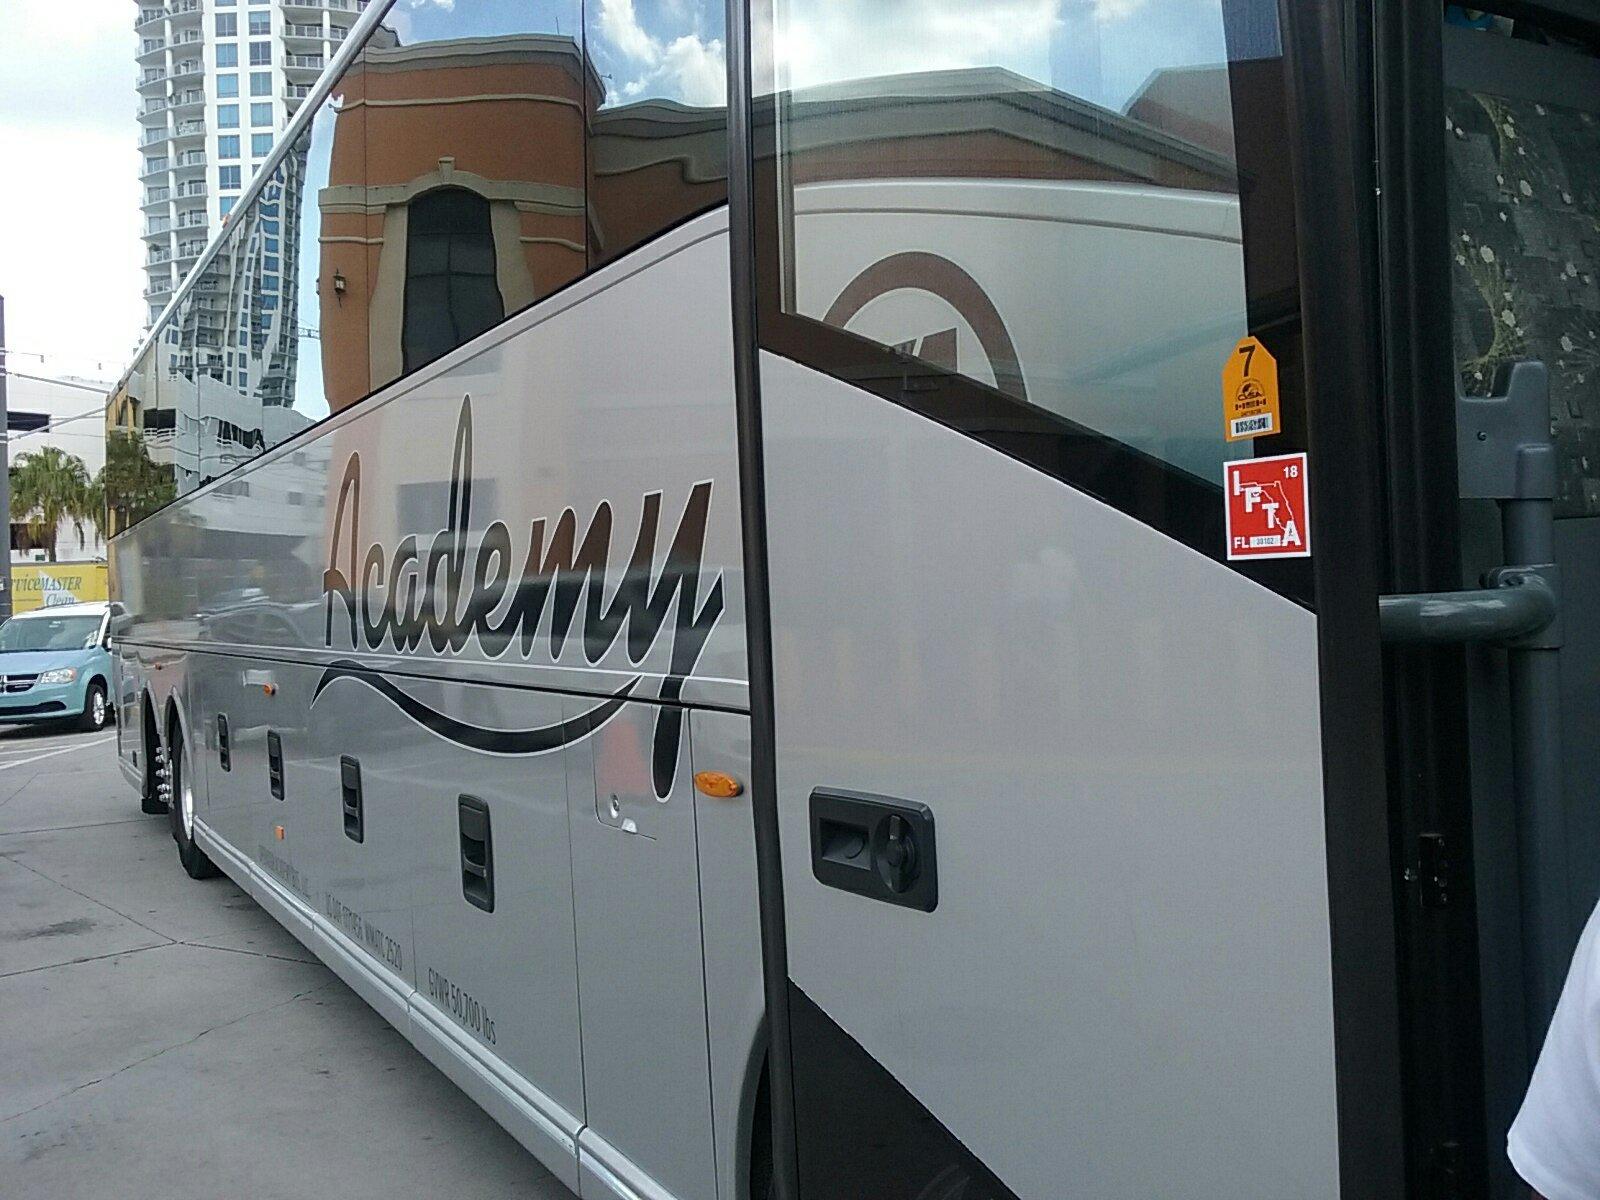 Tampa Bay Terminal 2. Tampa skies as we head back to Ft. Lauderdale.